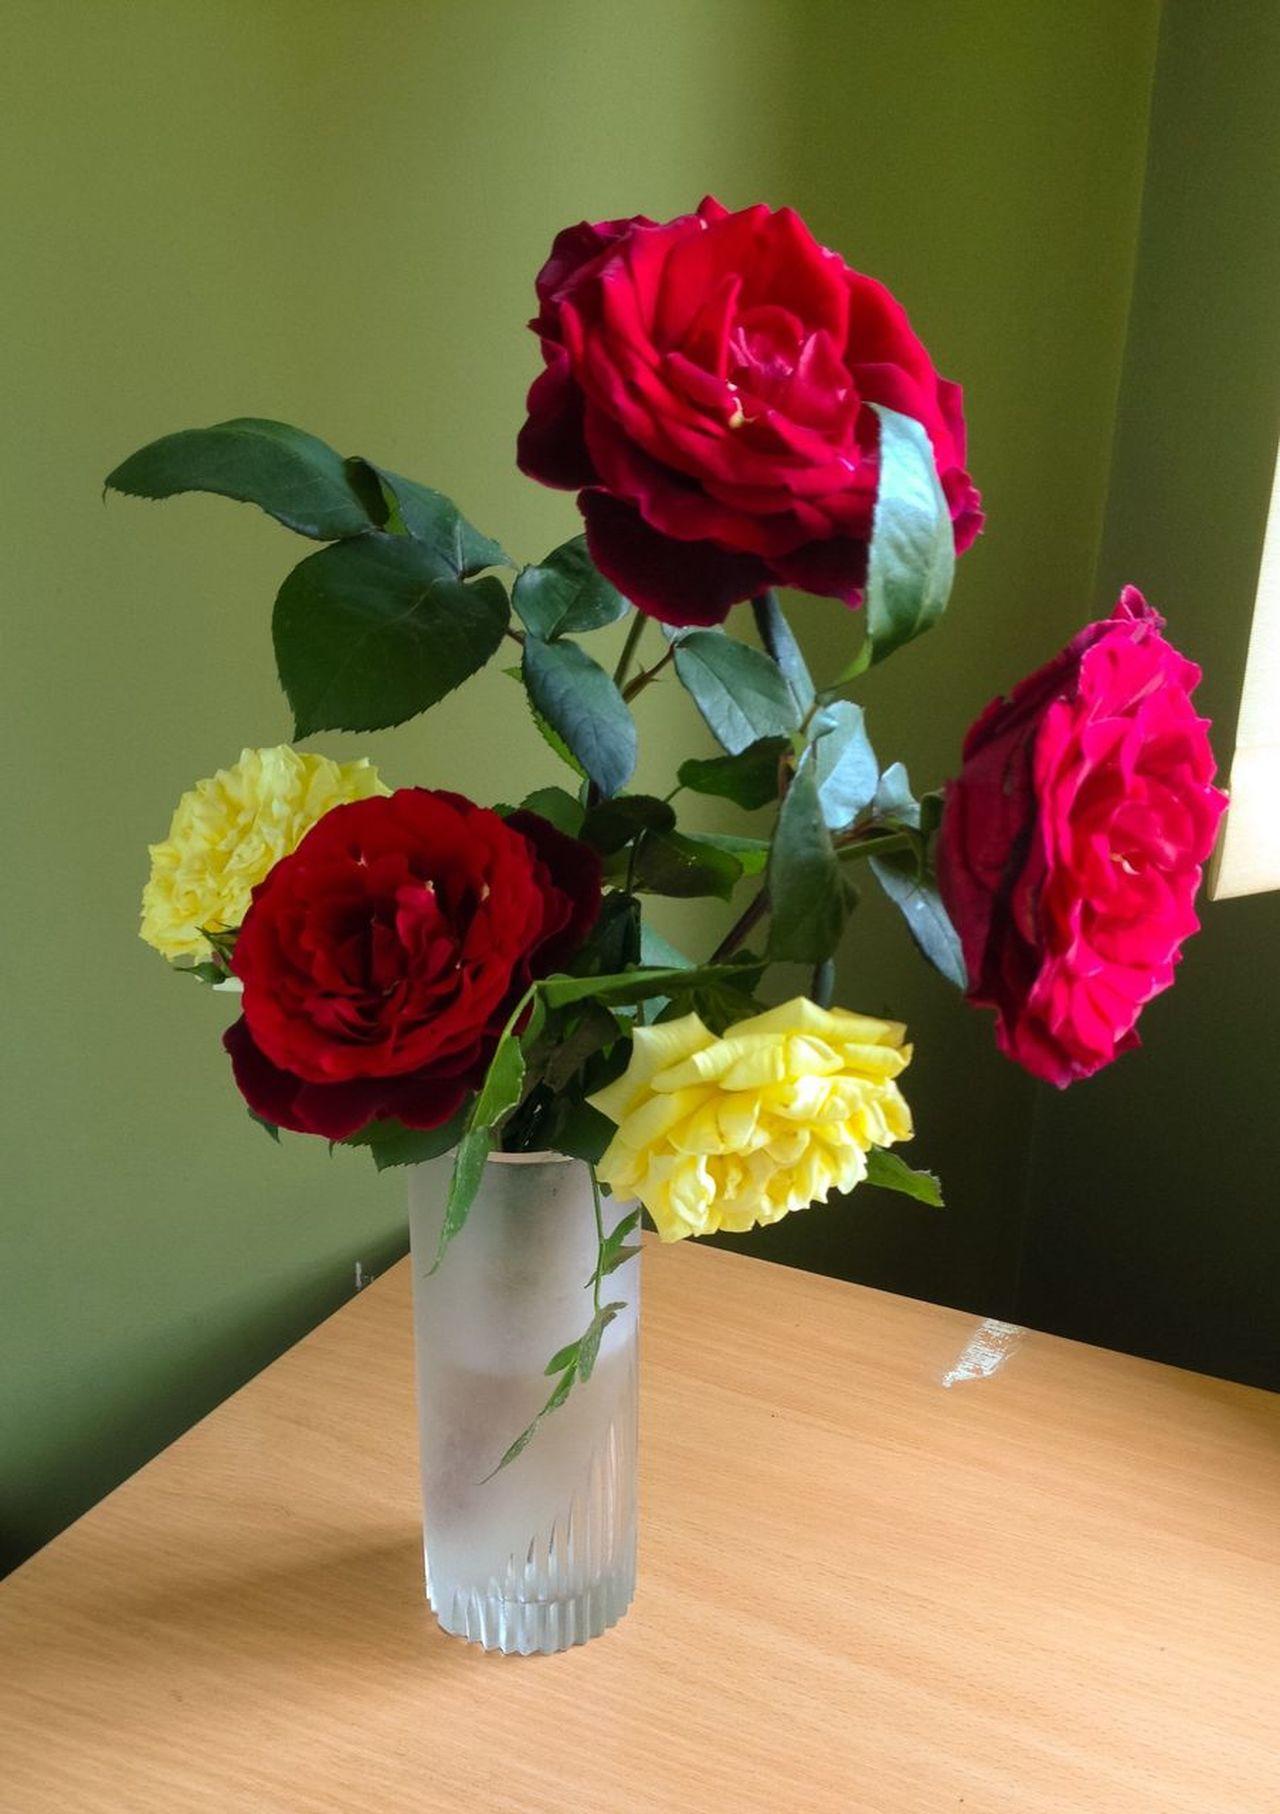 Roses Vase Bouquet Of Roses Bouquet Flowers Yellow Roses Red Roses Red Rose♥ Roses Blossom